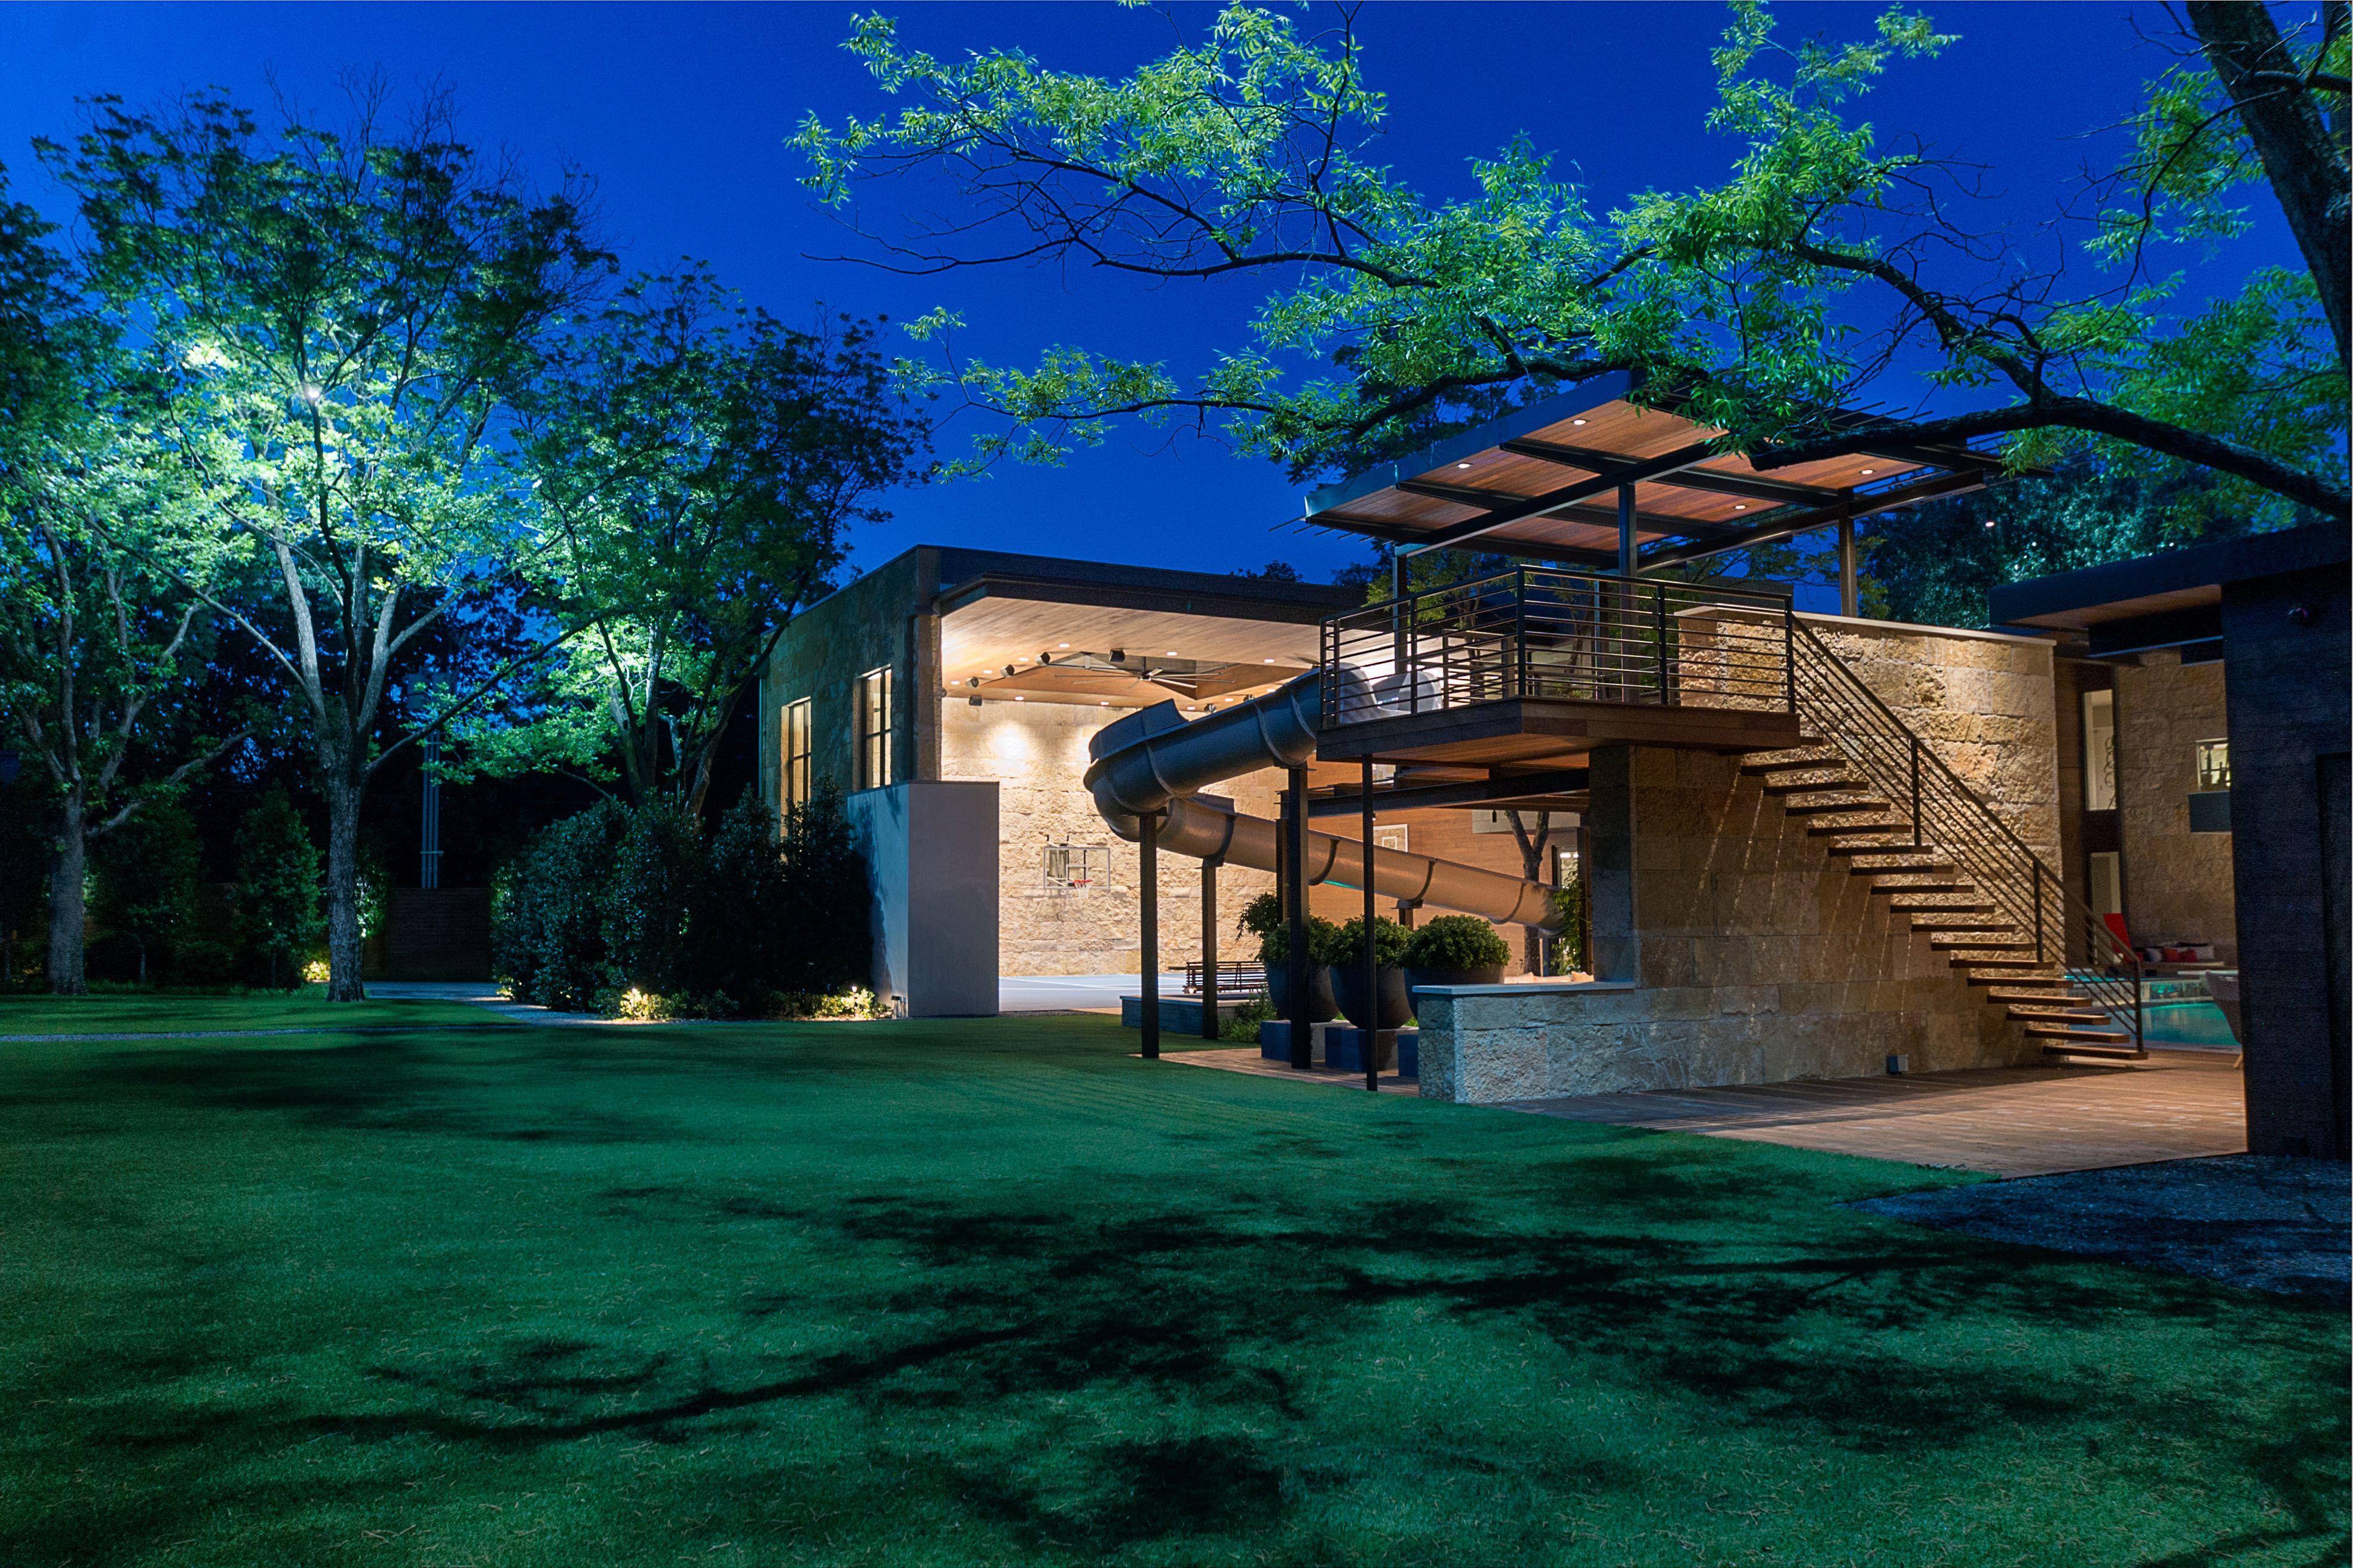 Custom Design Build Landscape And Architectural Lighting Landscape Lighting Design Outdoor Landscape Lighting Landscape Lighting